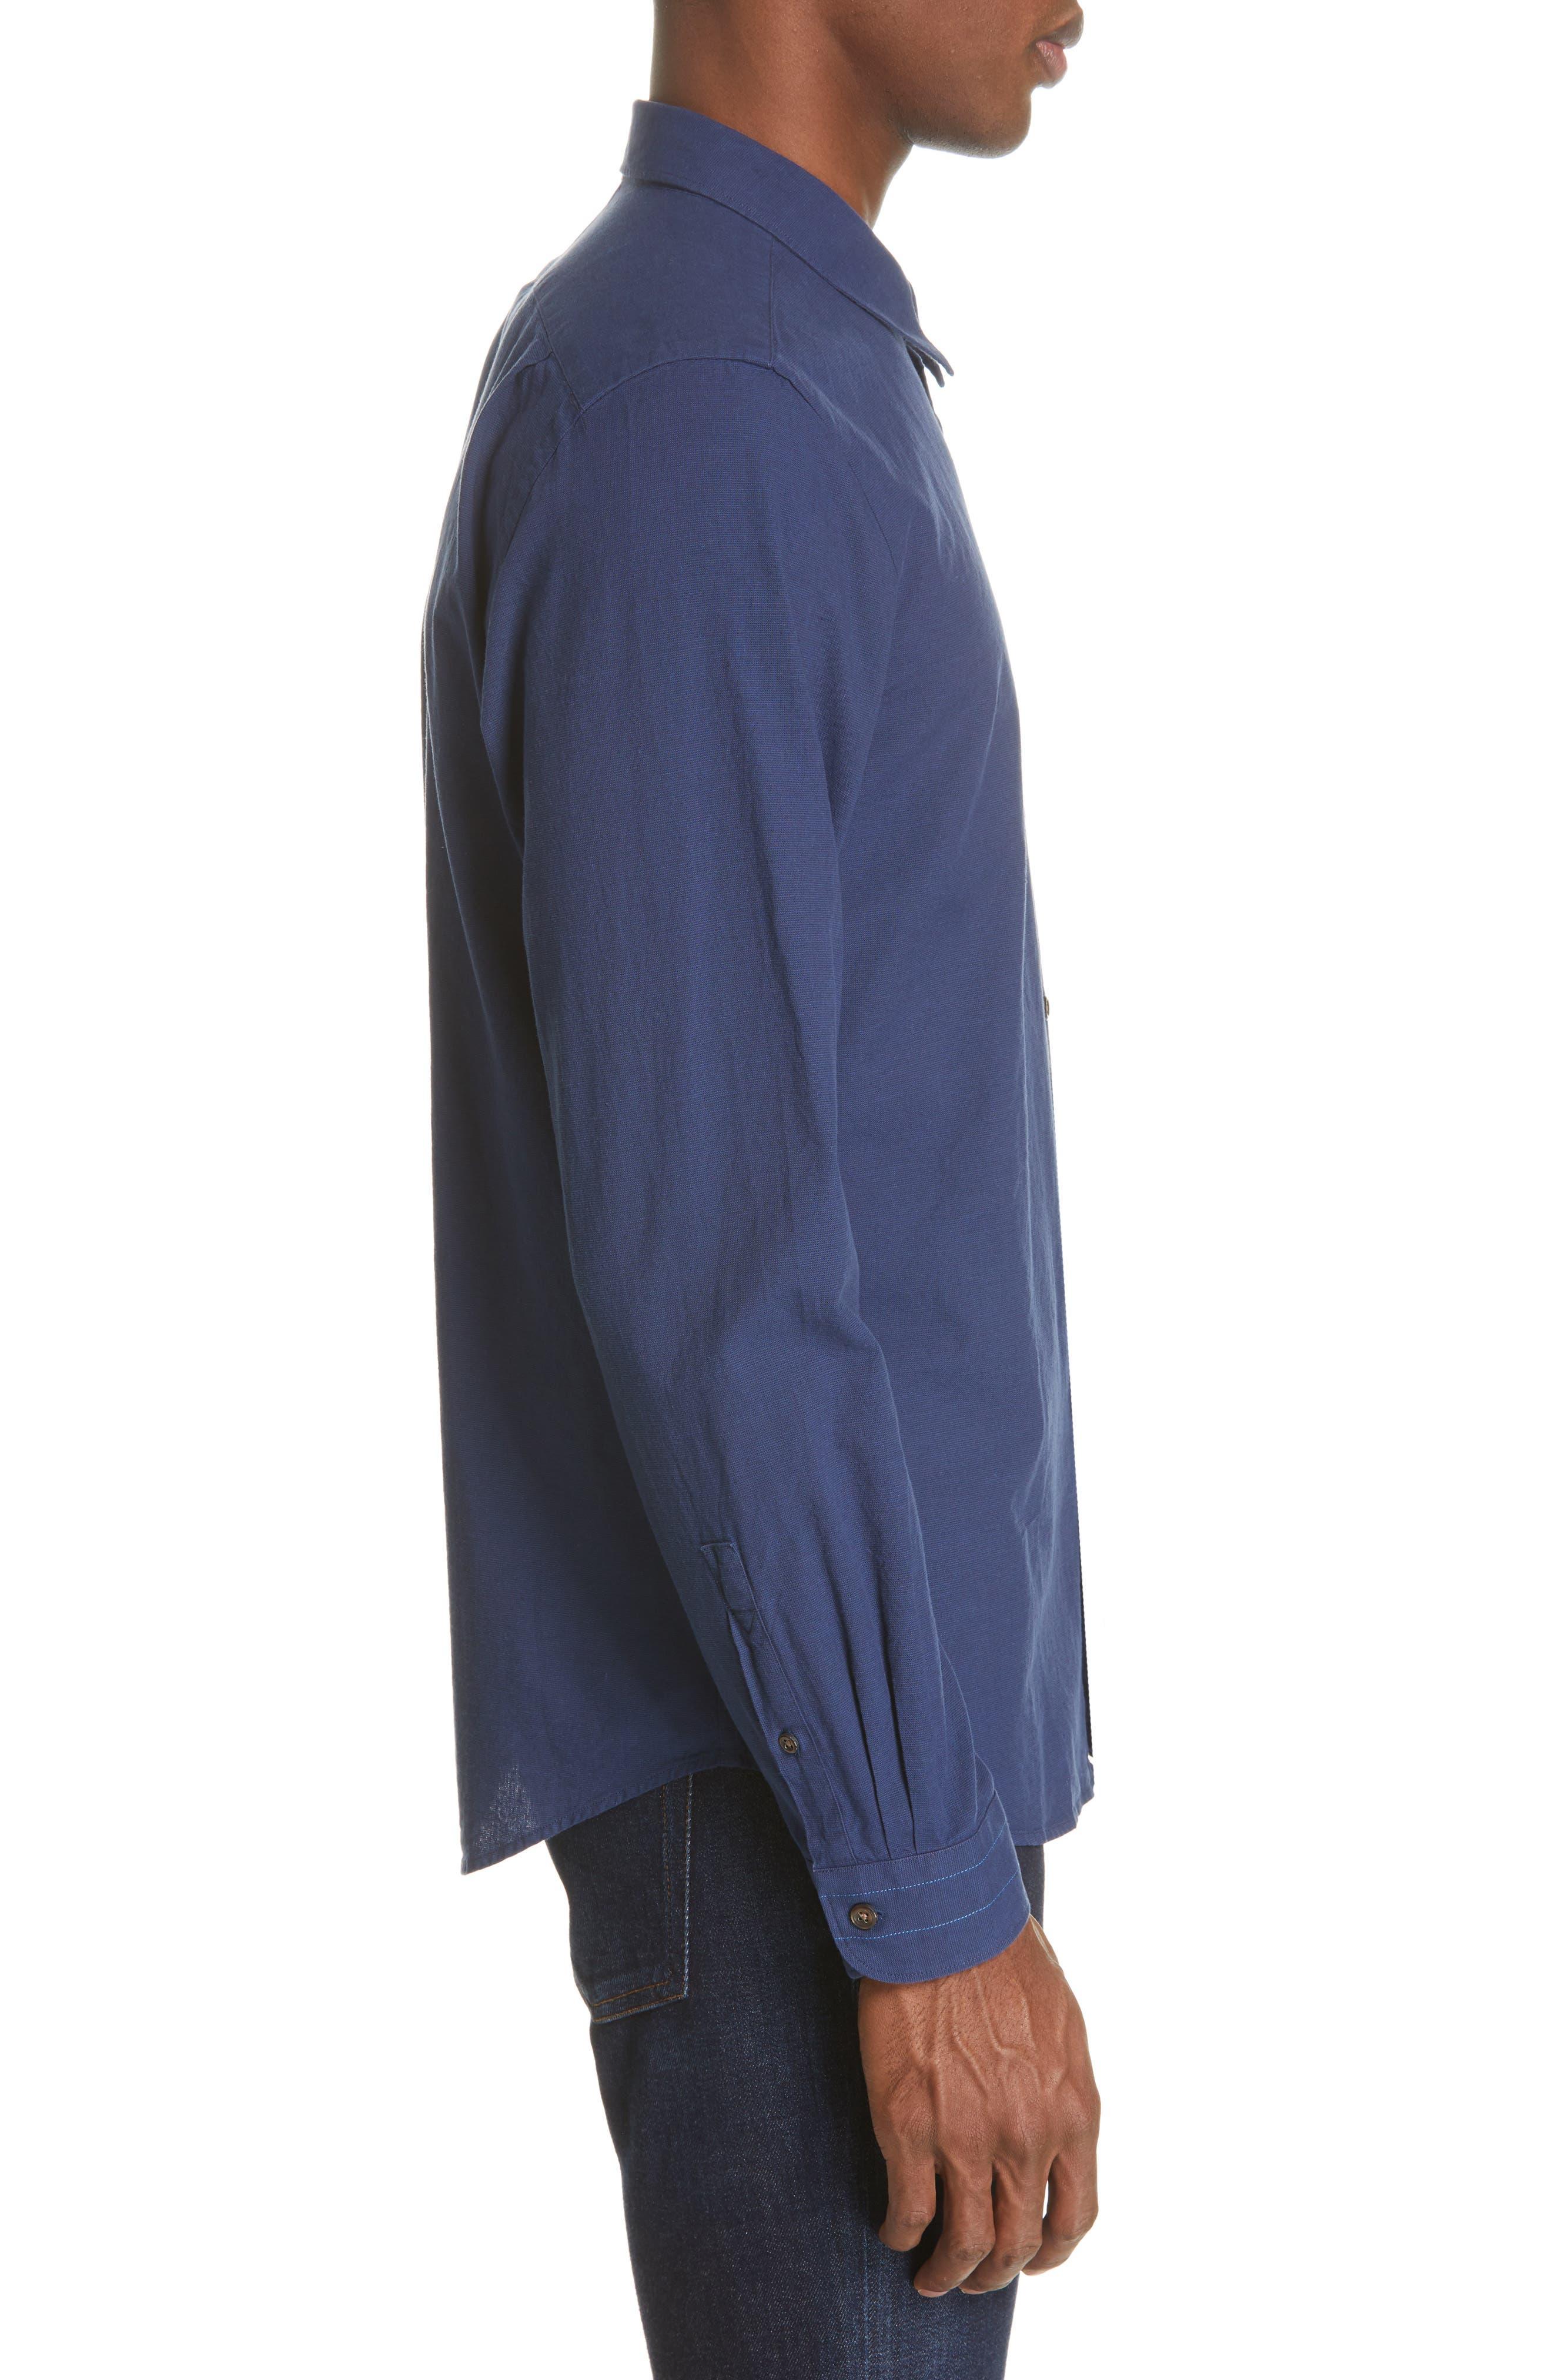 PS PAUL SMITH, Contrast Sport Shirt, Alternate thumbnail 4, color, BLUE